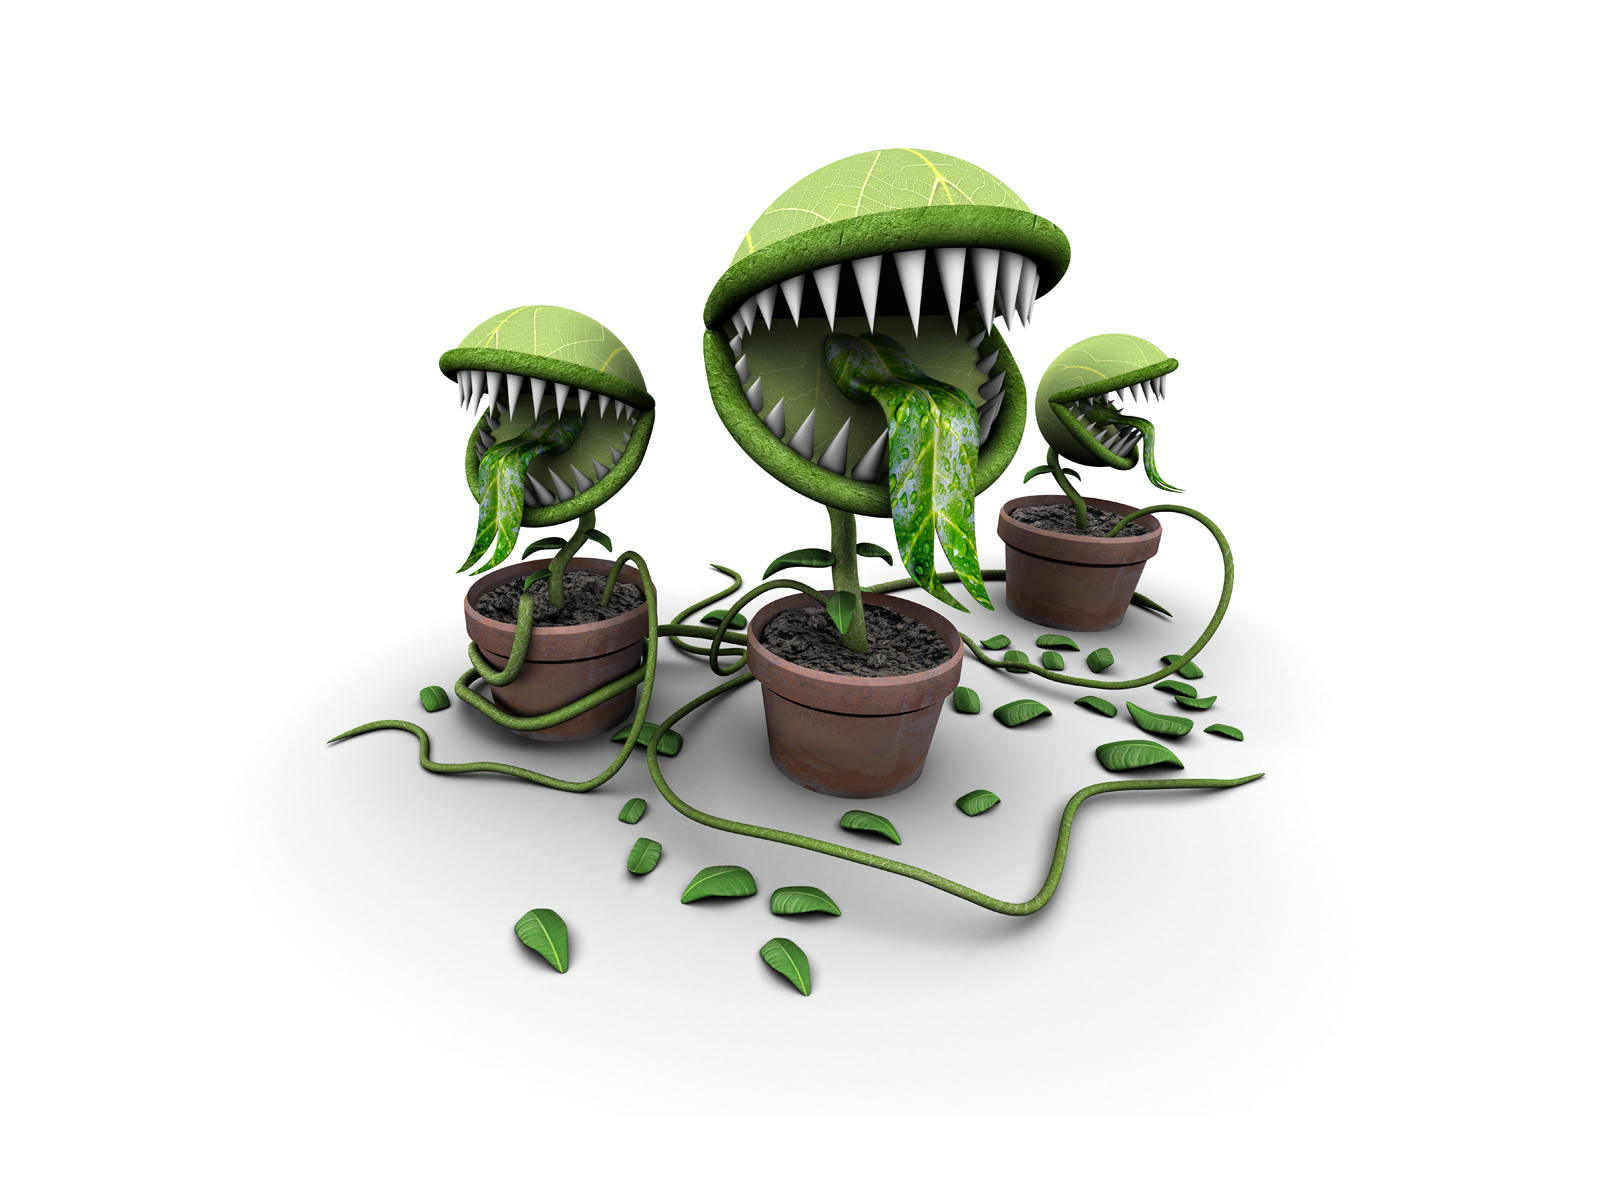 http://www.dotcrush.com/wp-content/uploads/2011/04/3D-Plants.jpg